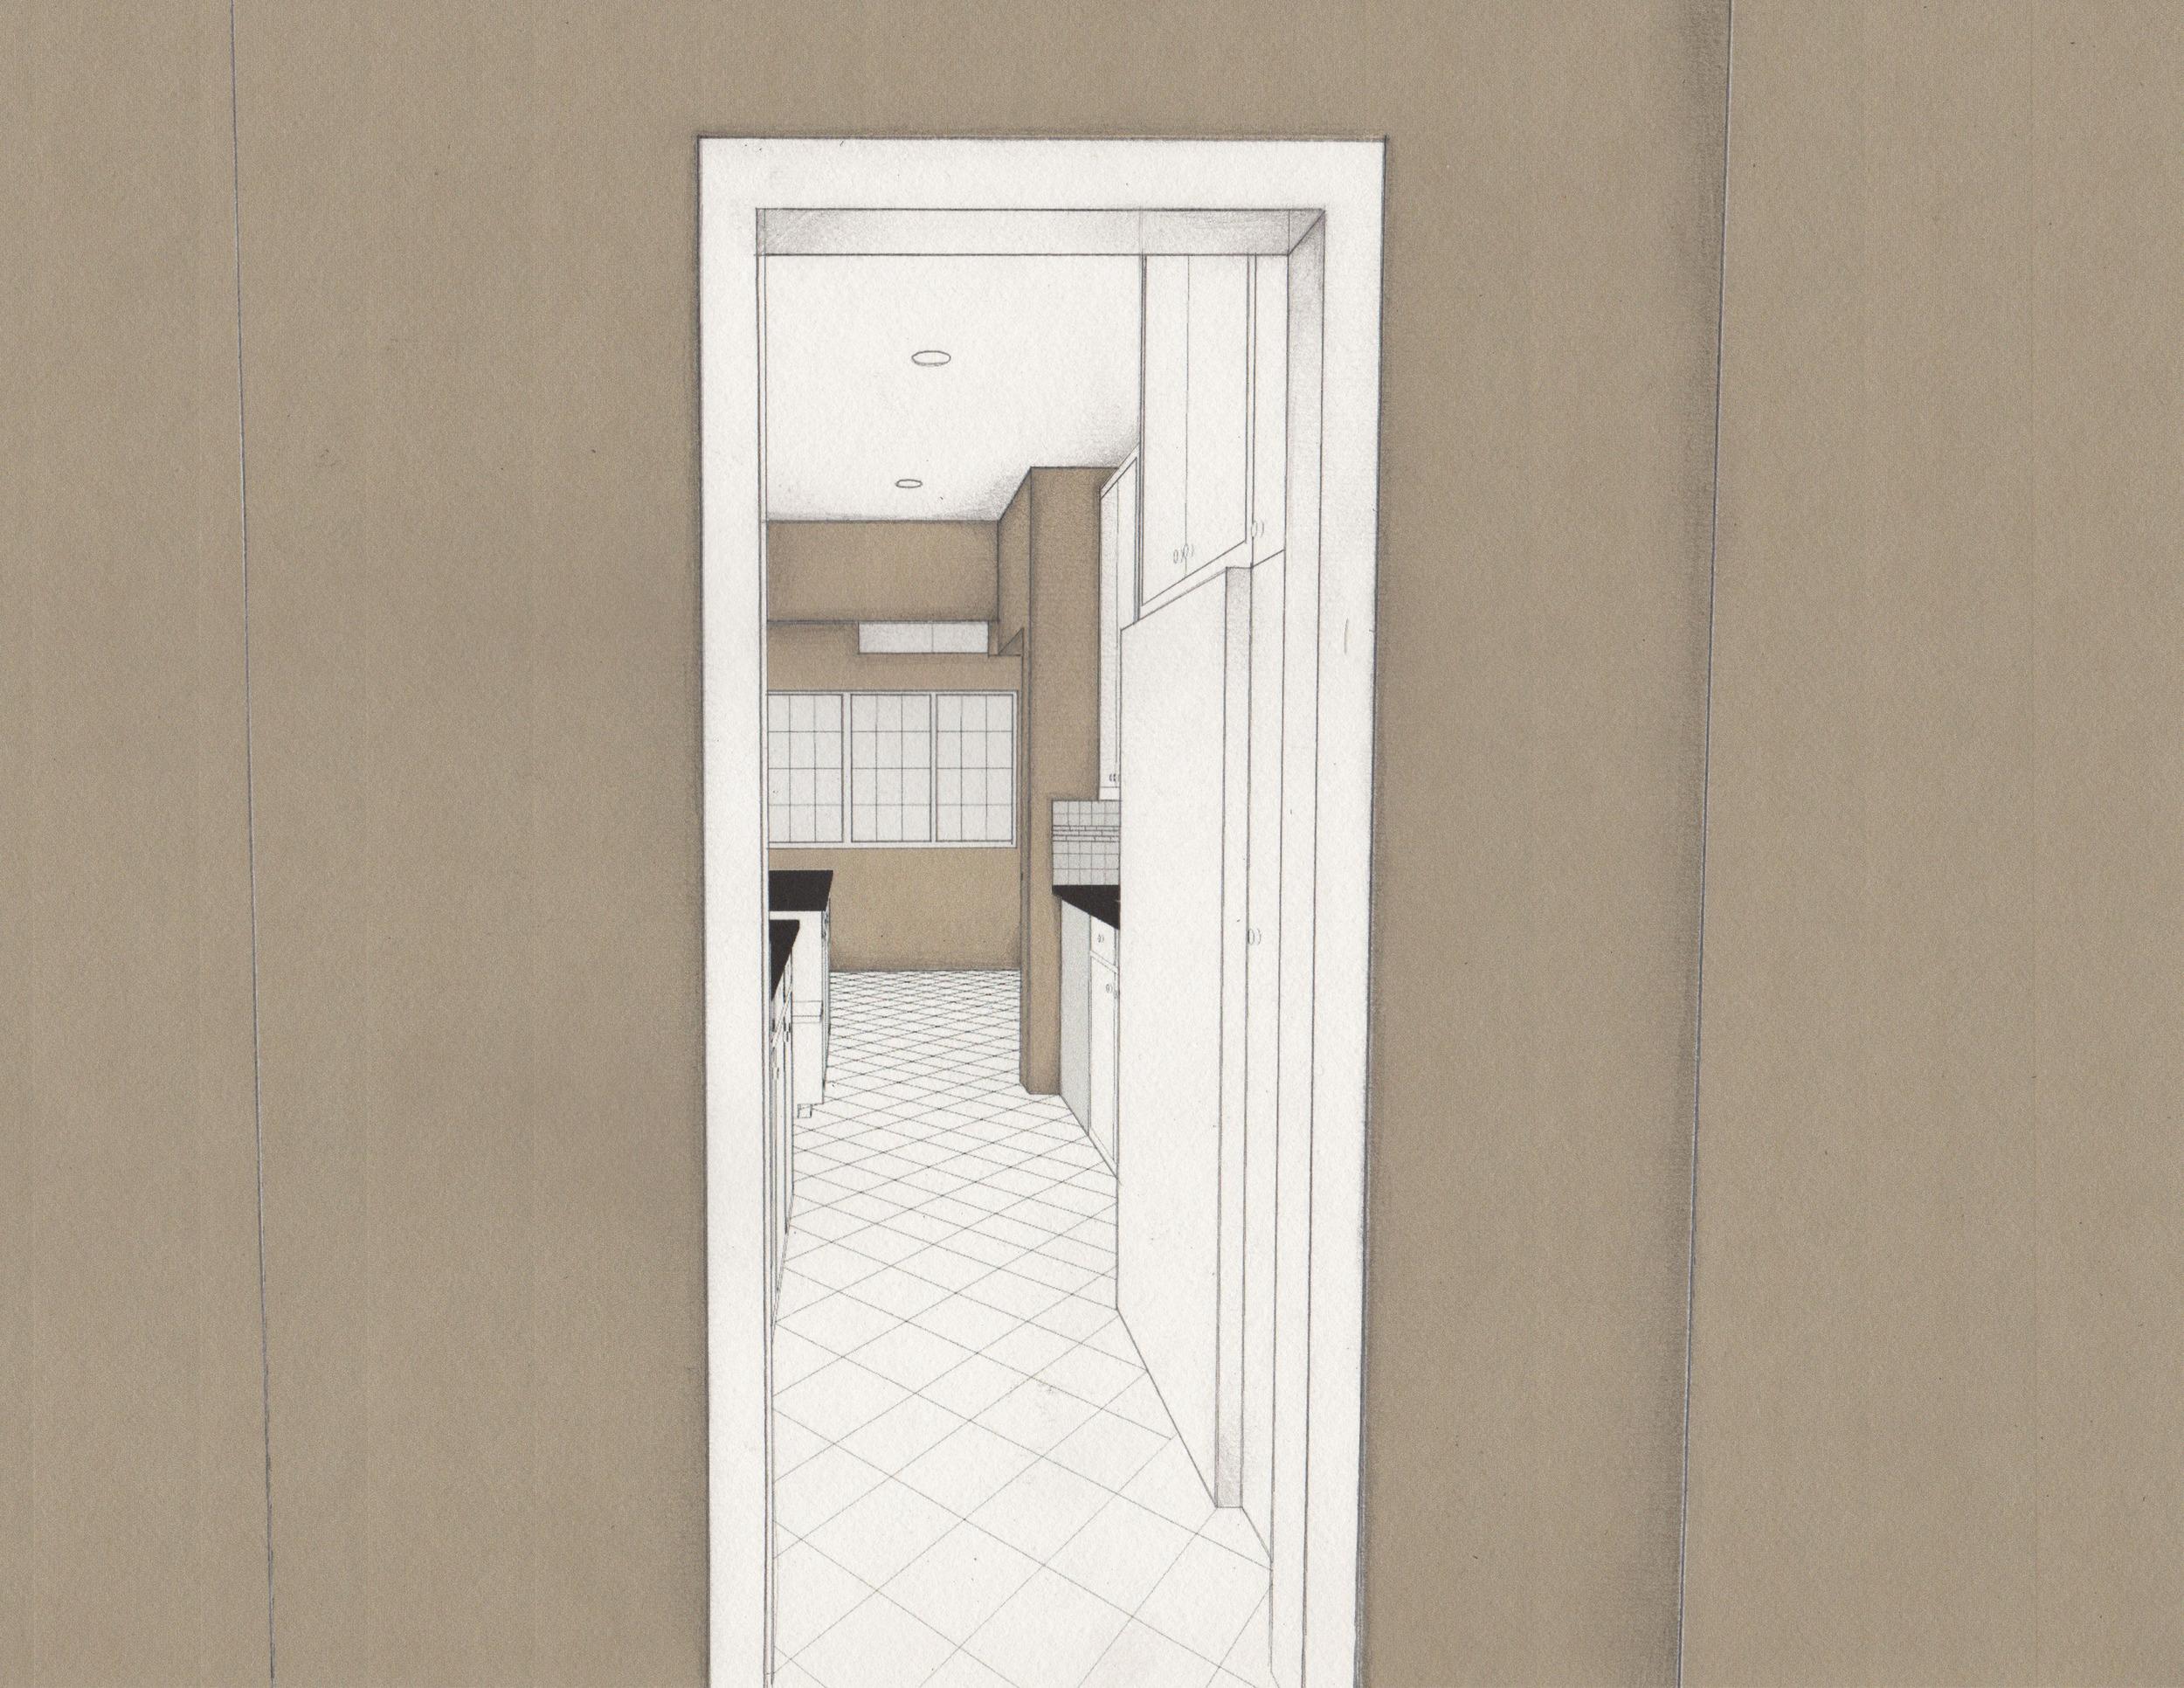 Proposed foyer design